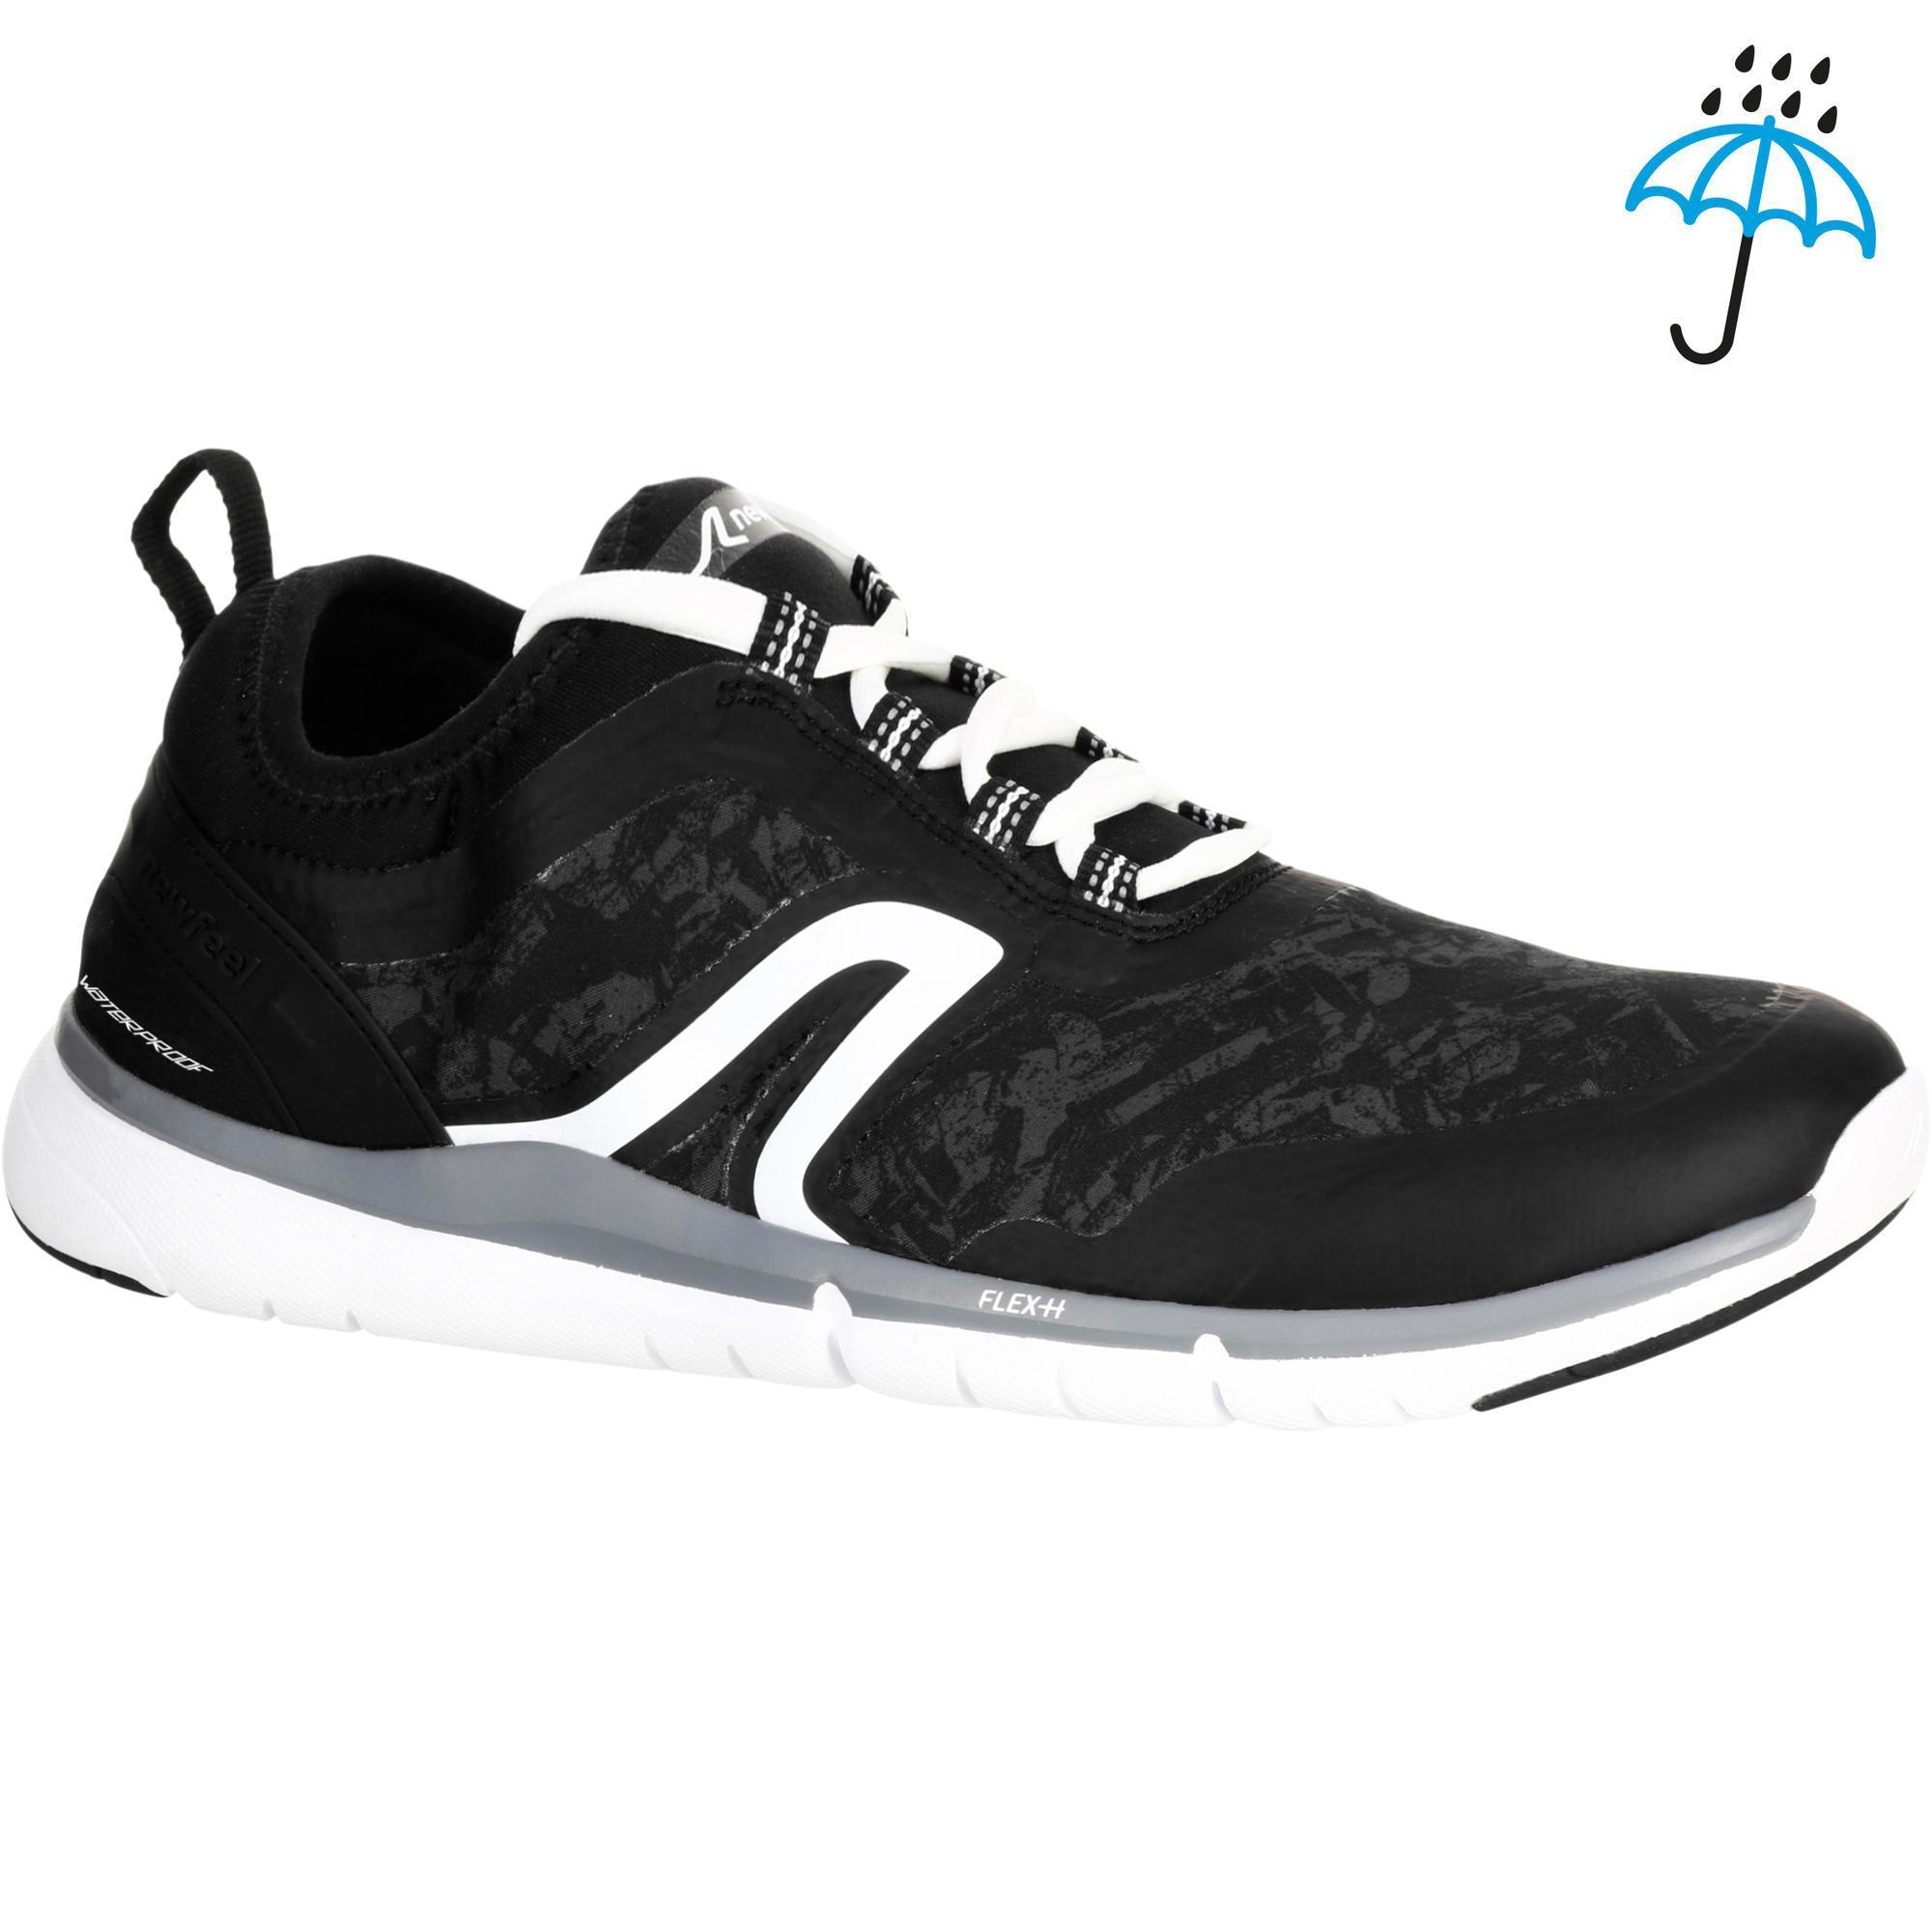 76c10c1e880f1 chaussure newfeel essensole